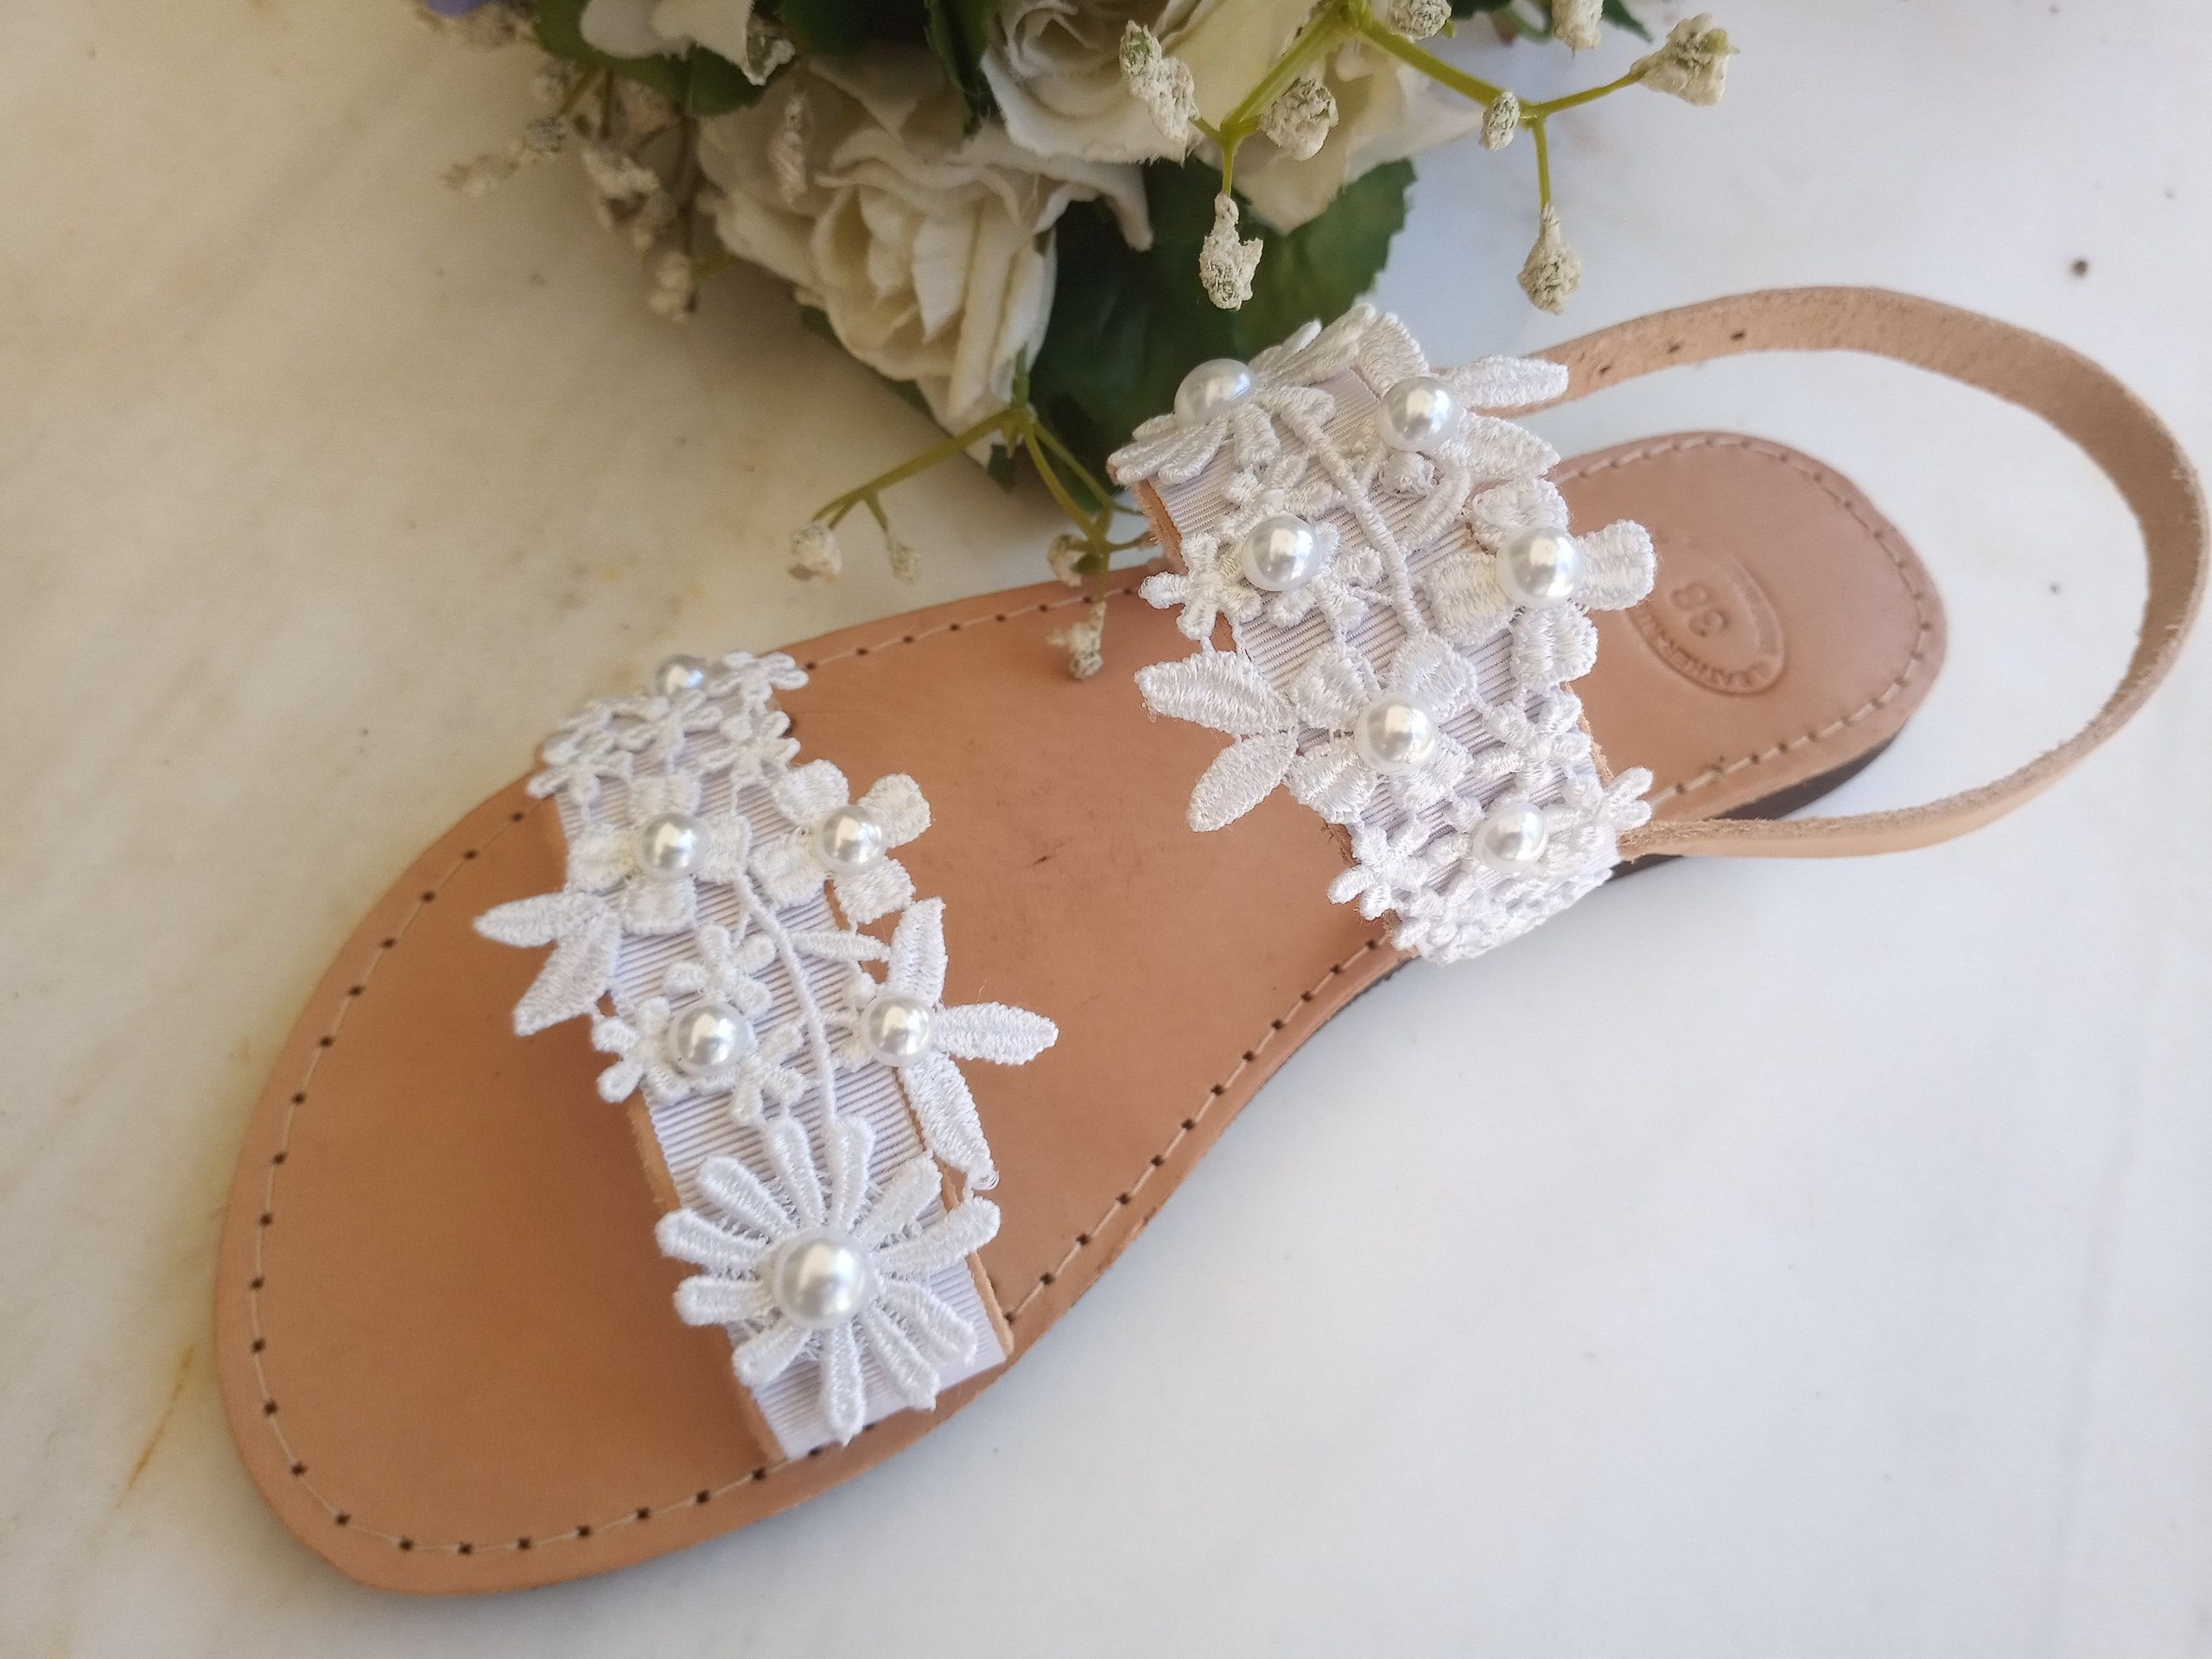 Wedding Sandals For Bride White Bridal Sandals Pearls Etsy In 2020 Wedding Sandals For Bride Bridal Sandals Wedding Sandals